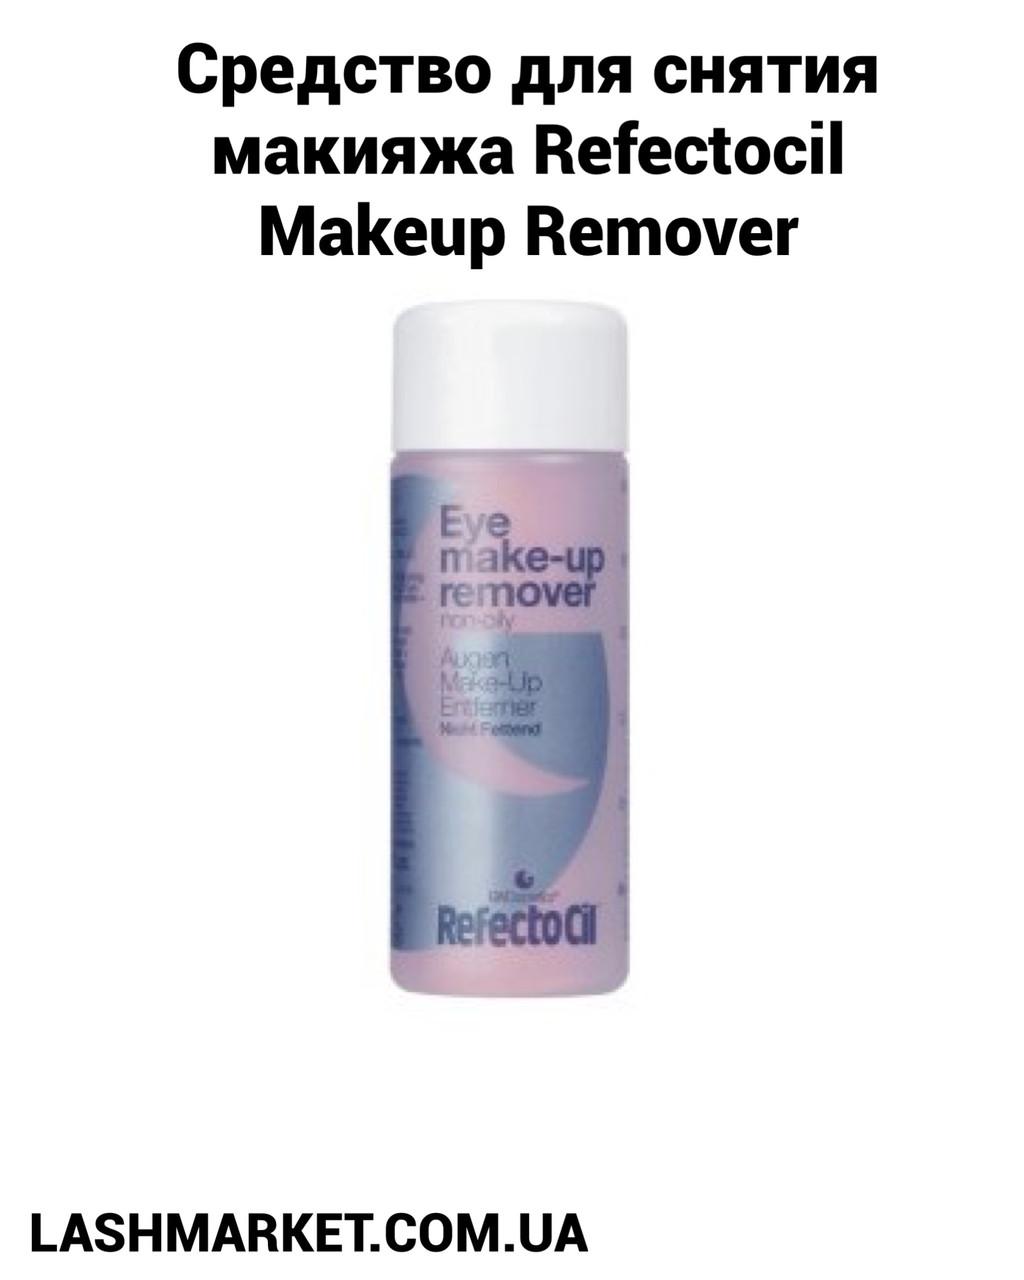 Средство для снятия макияжа Refectocil Make-up Remover, 100 мл